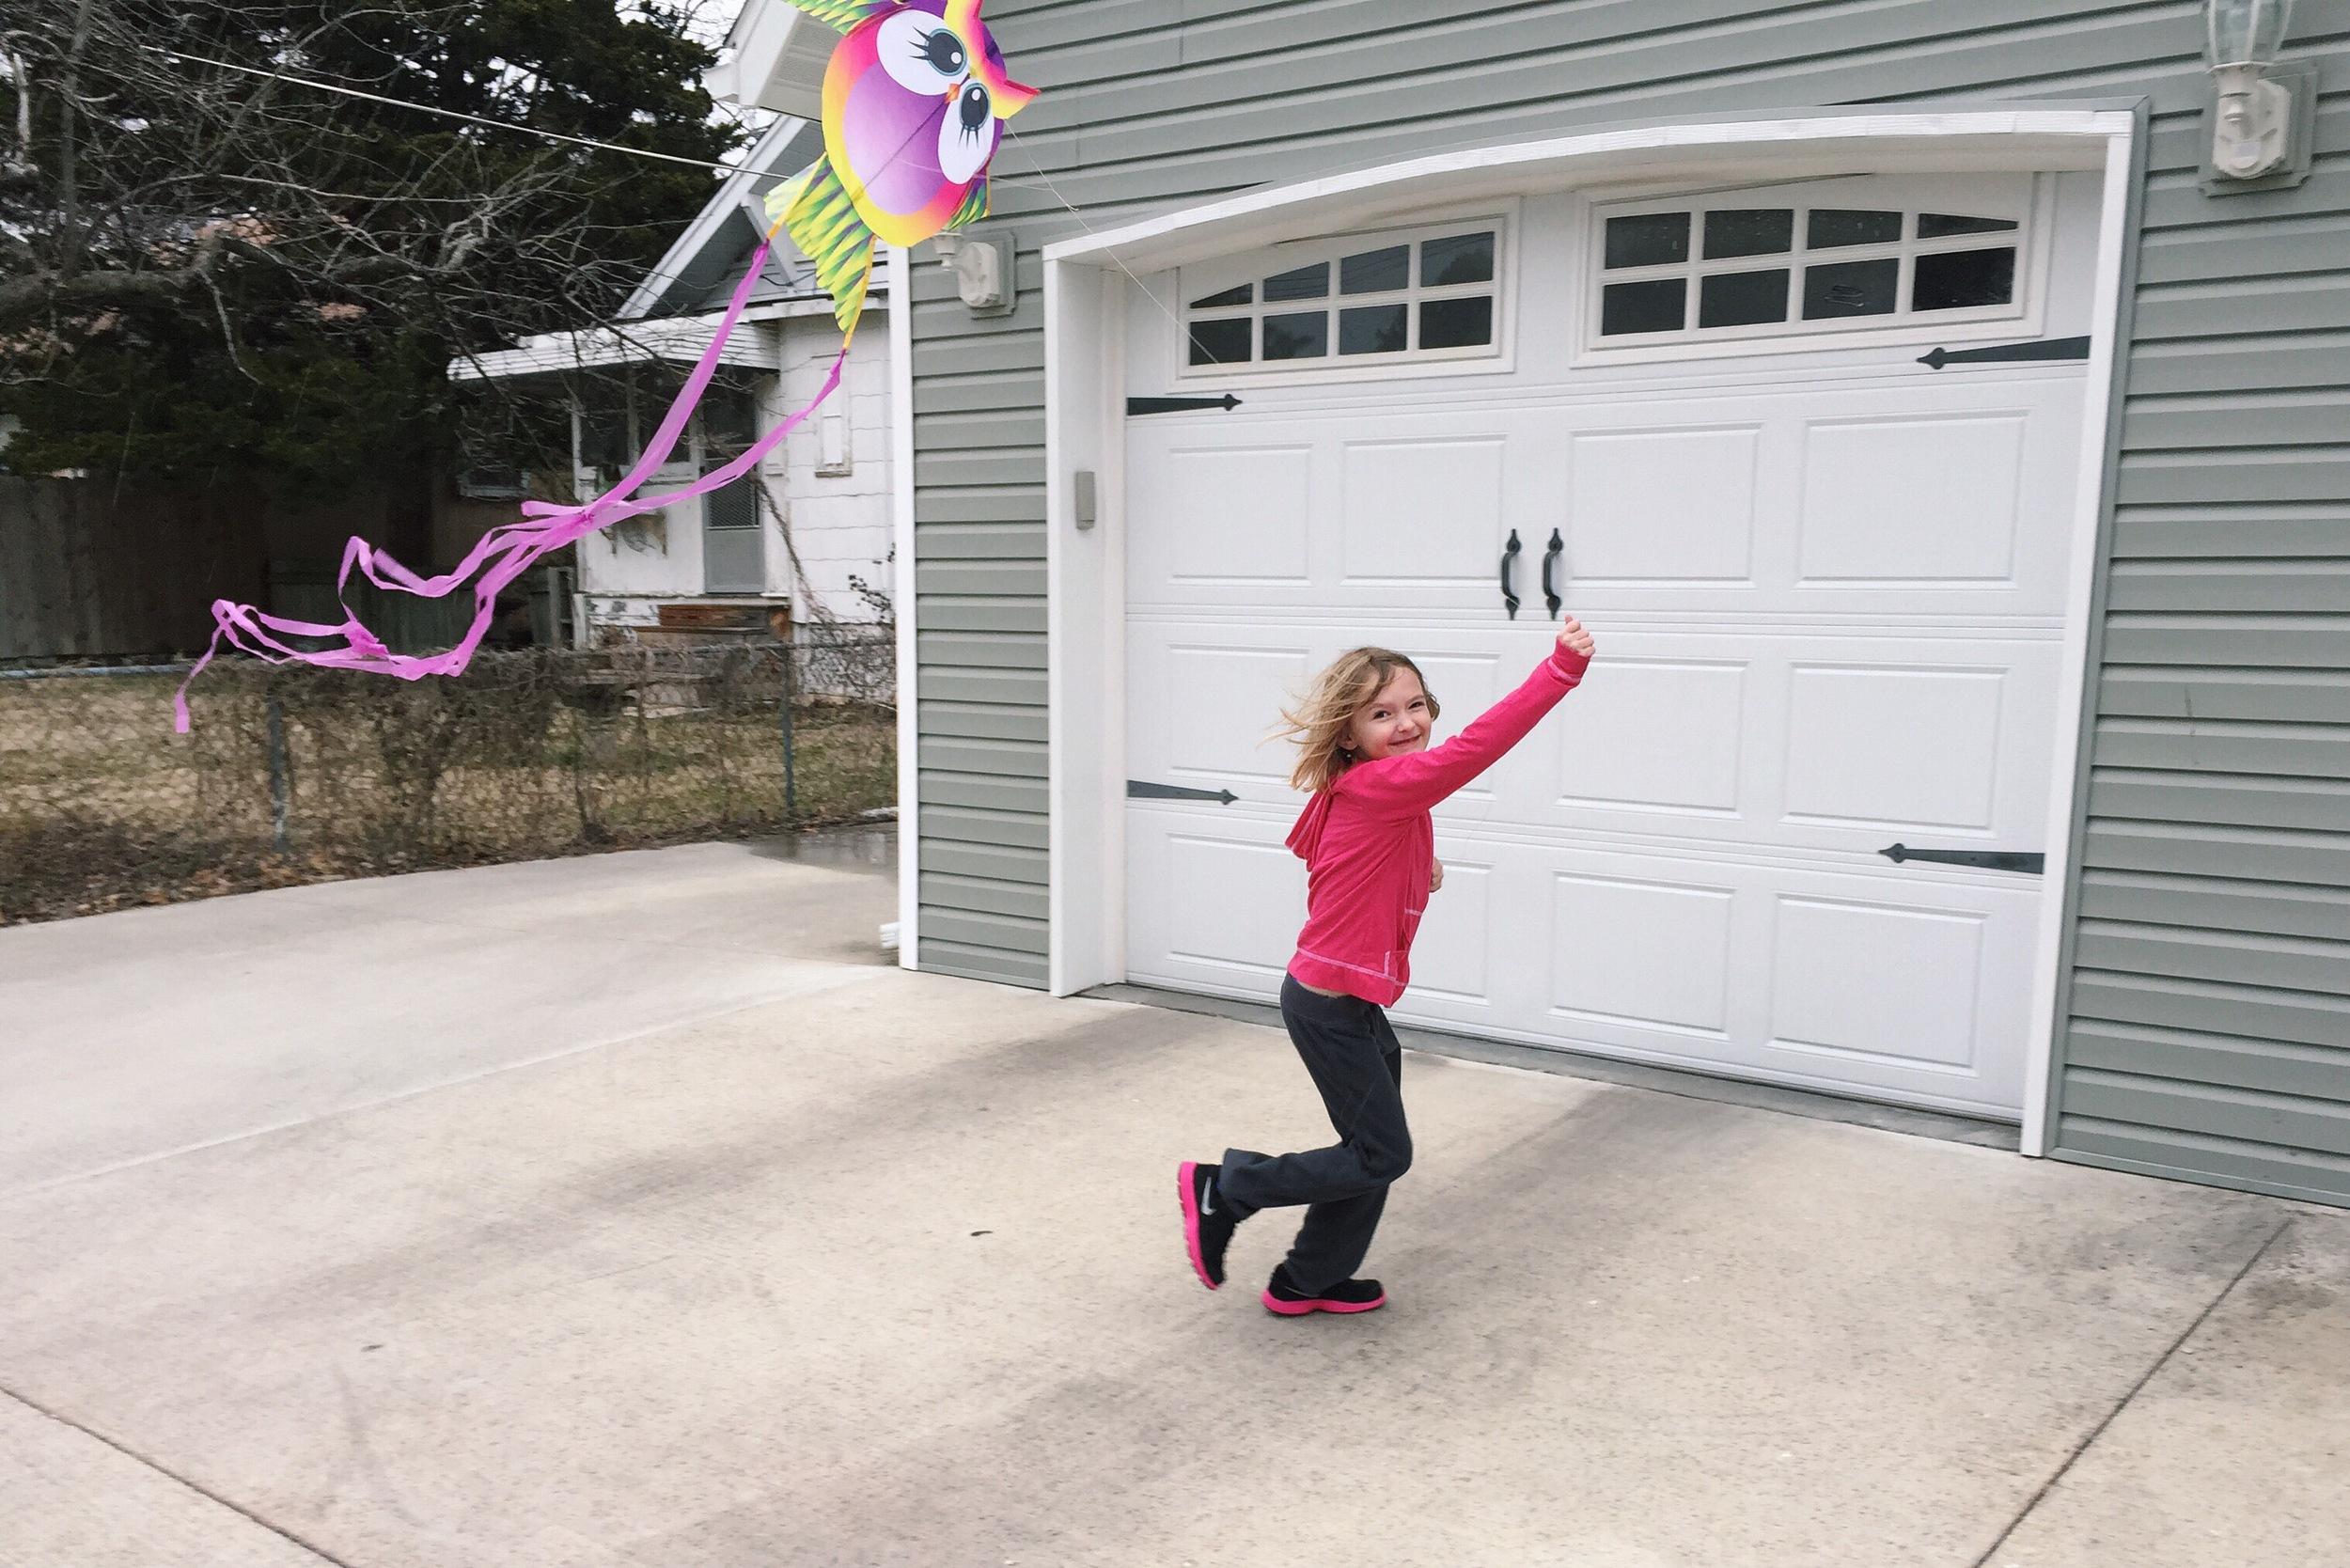 kite | year of creative habits